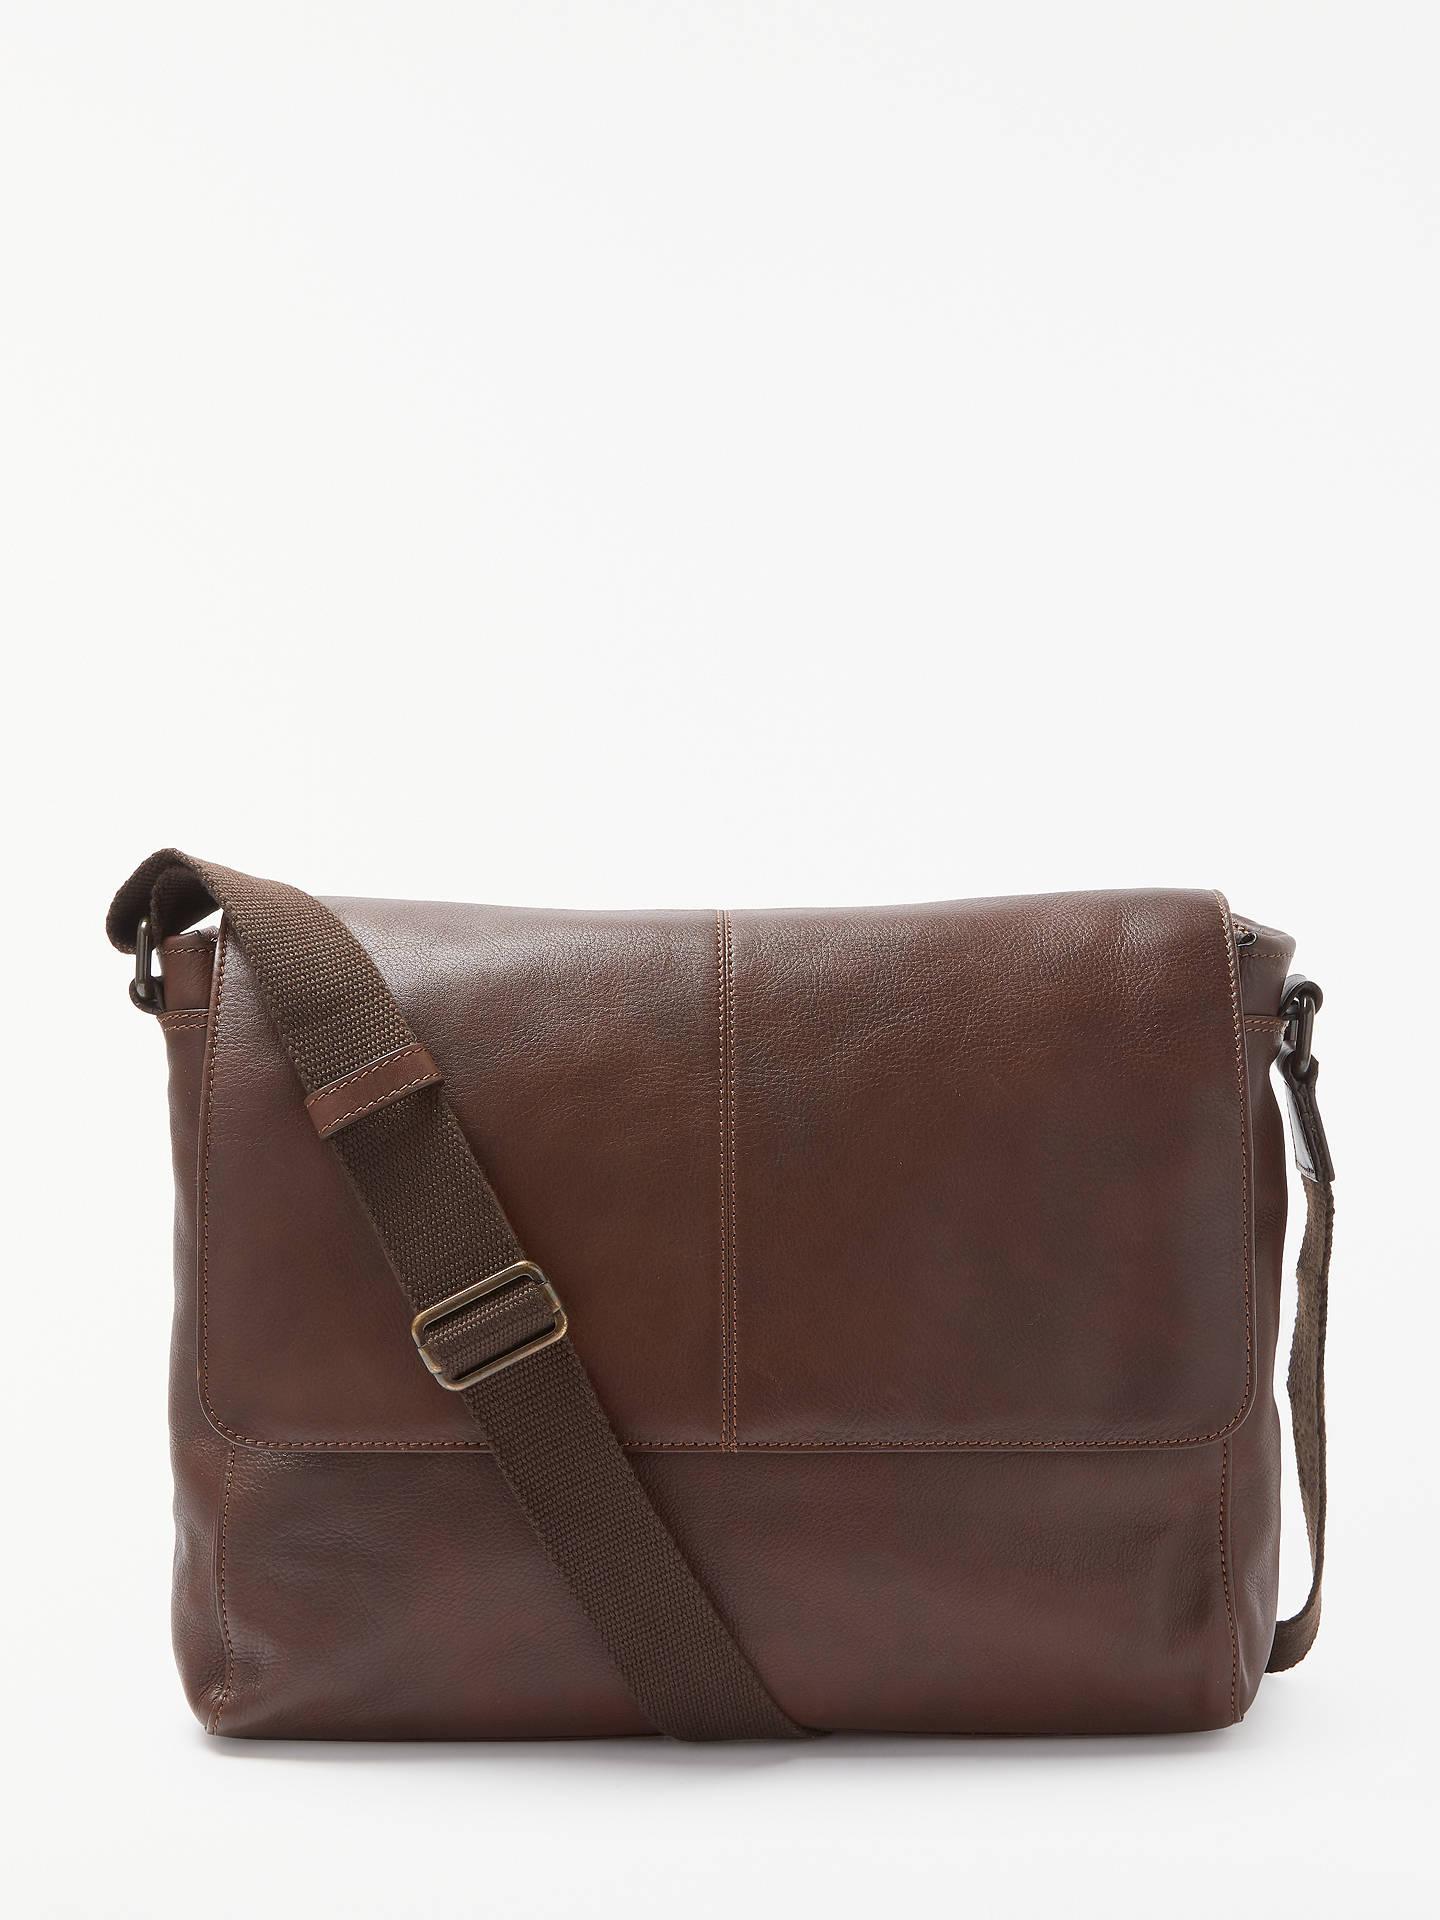 John Lewis Partners Gladstone 2 0 Leather Messenger Bag Brown